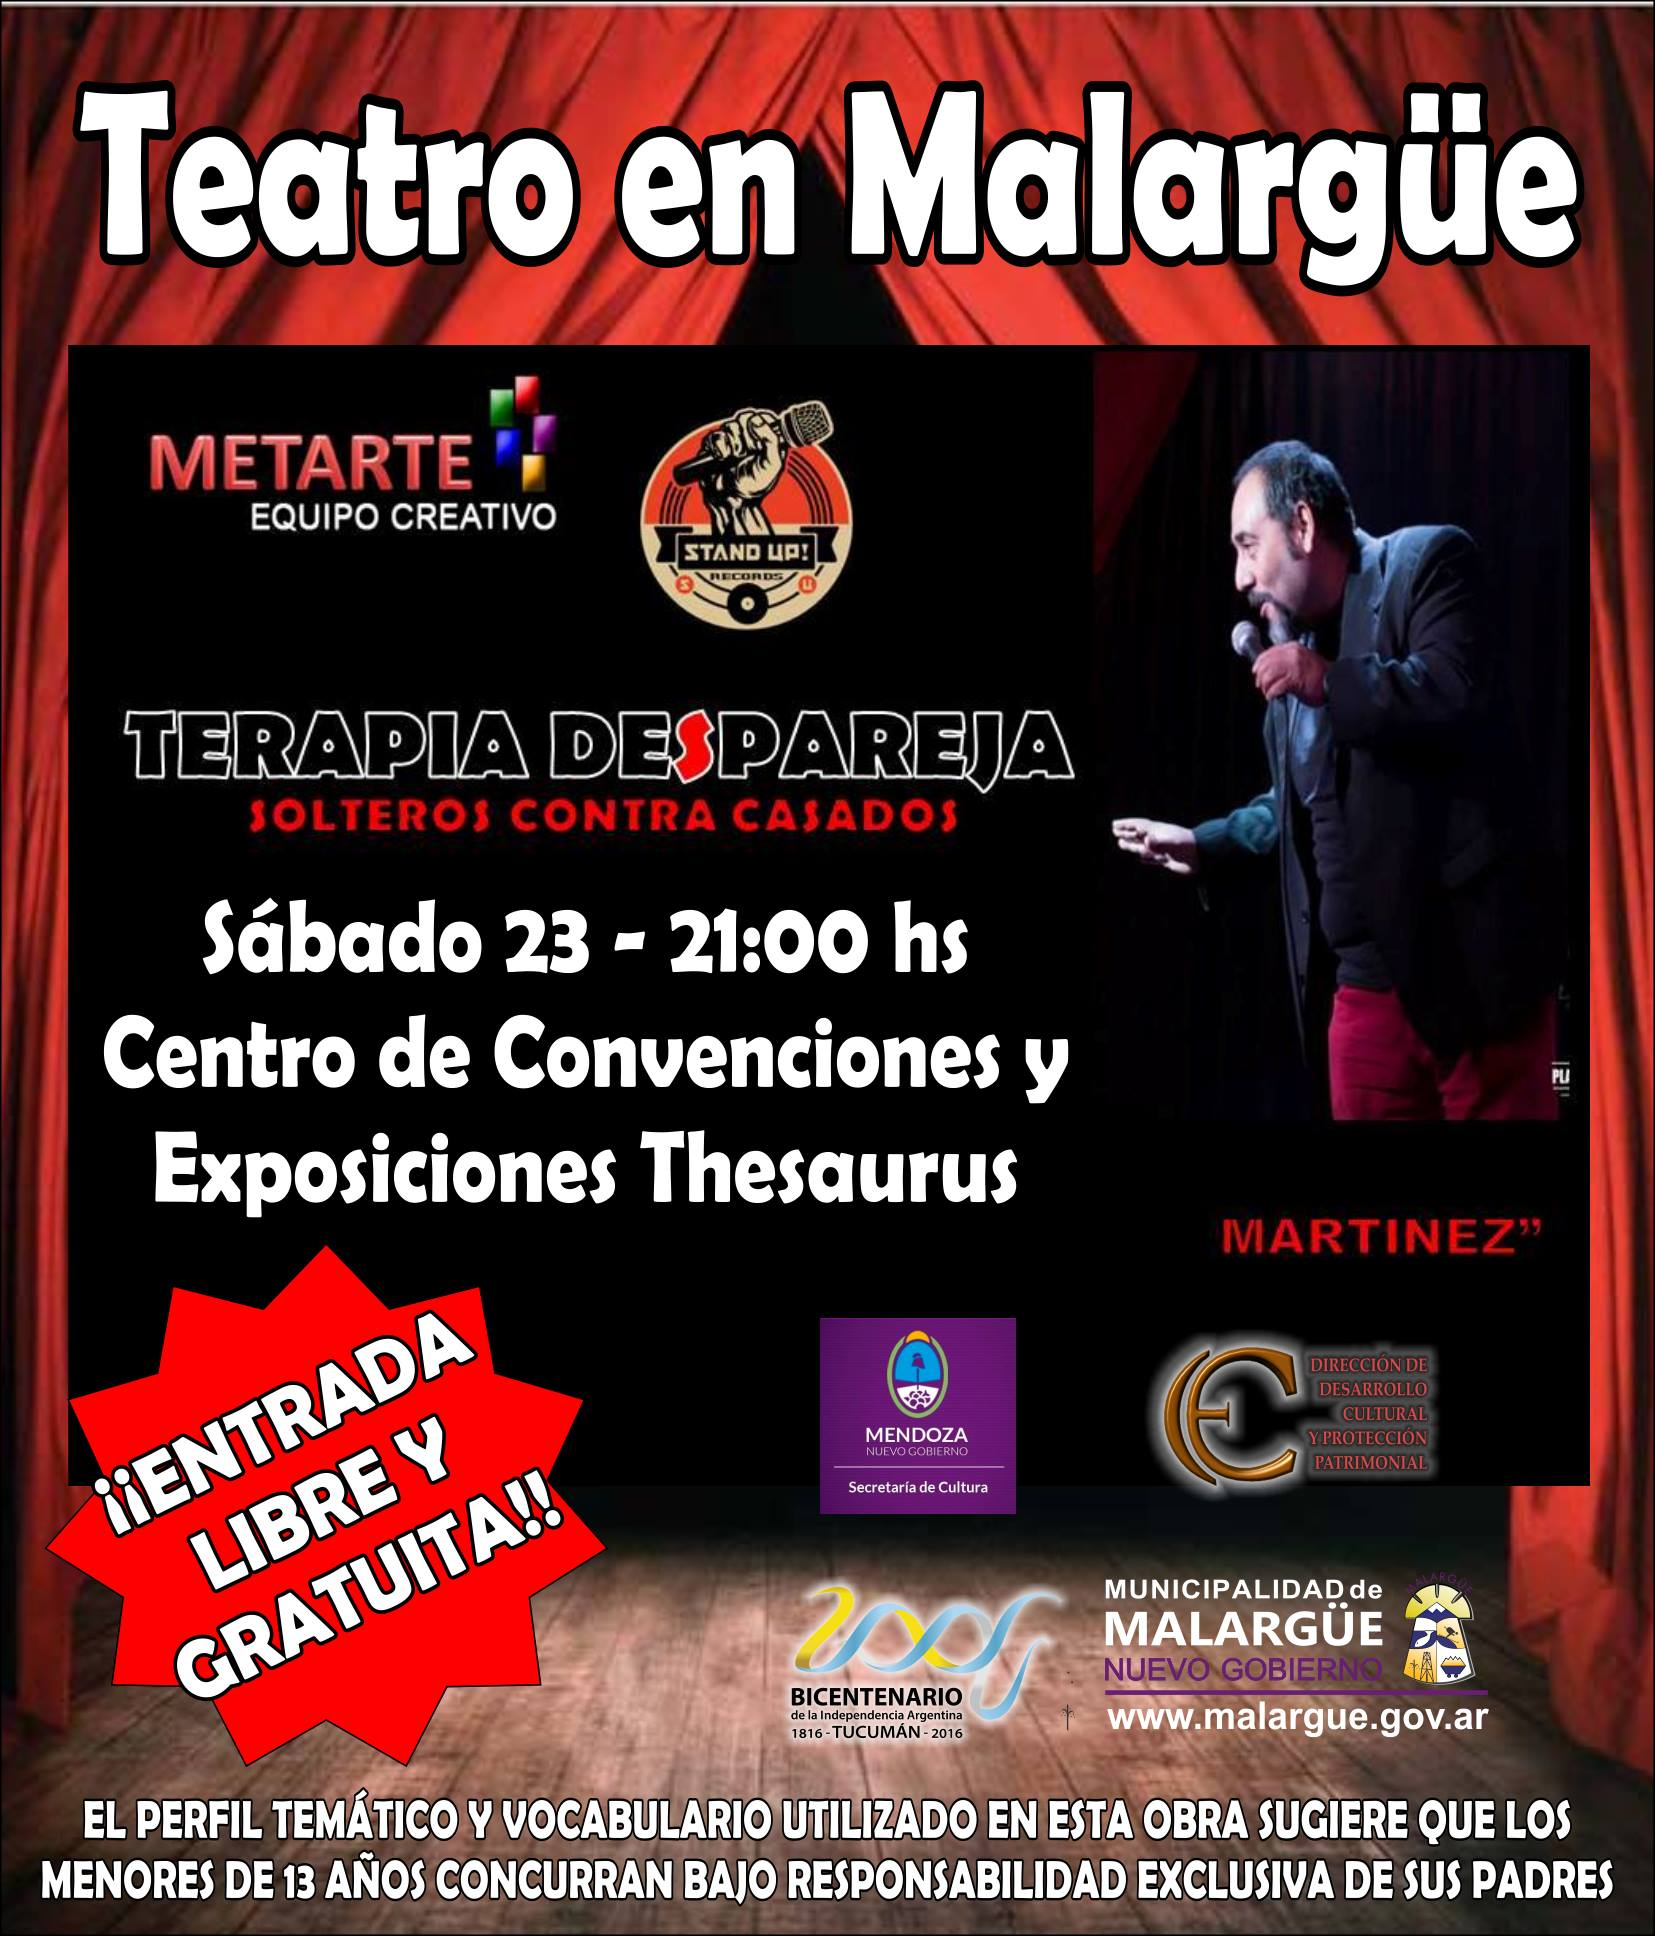 Teatro en Malargüe